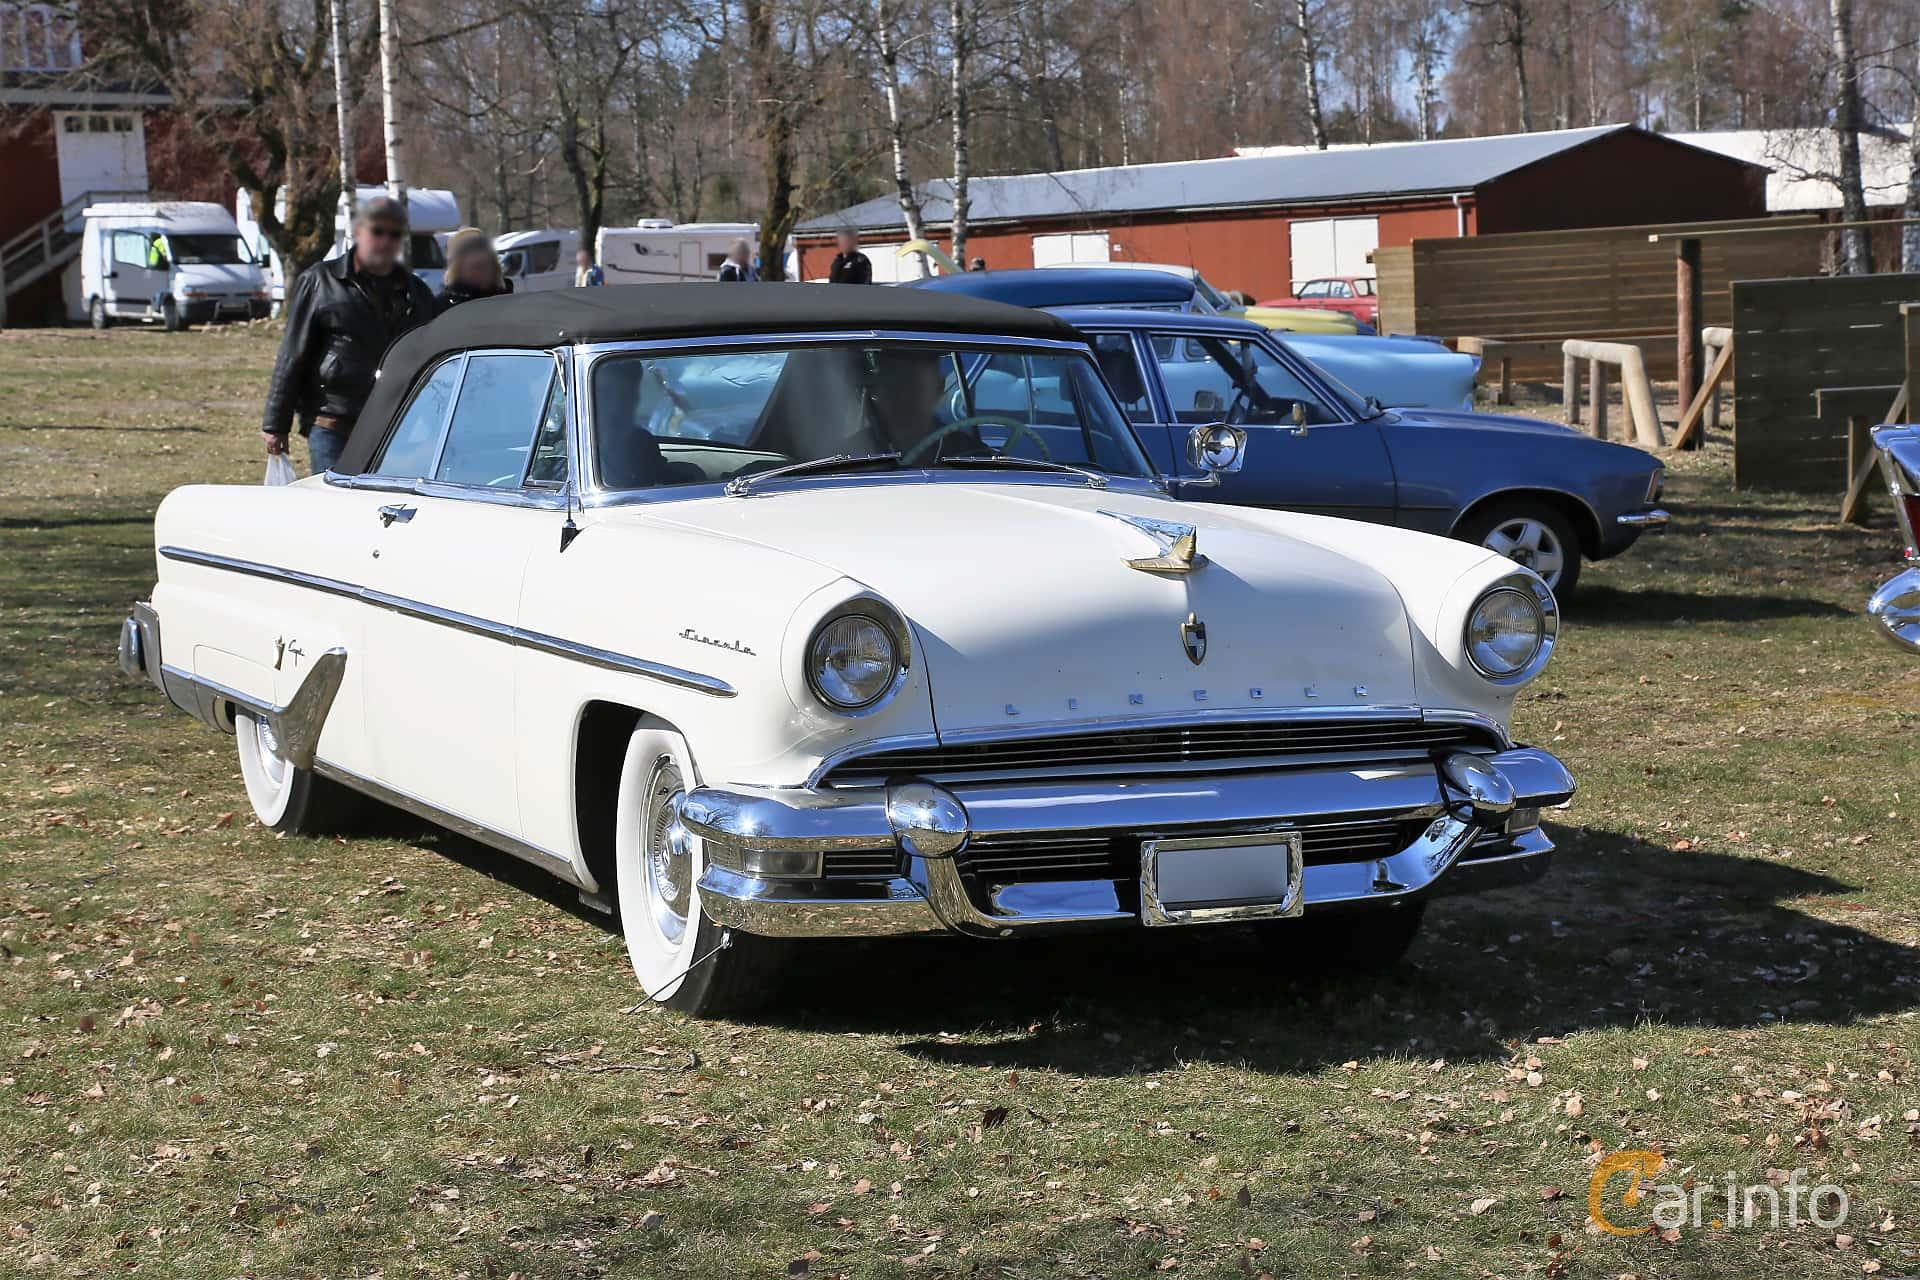 Lincoln Capri Convertible 5.2 V8 Automatic, 228hp, 1955 at Uddevalla Veteranbilsmarknad Backamo, Ljungsk 2019